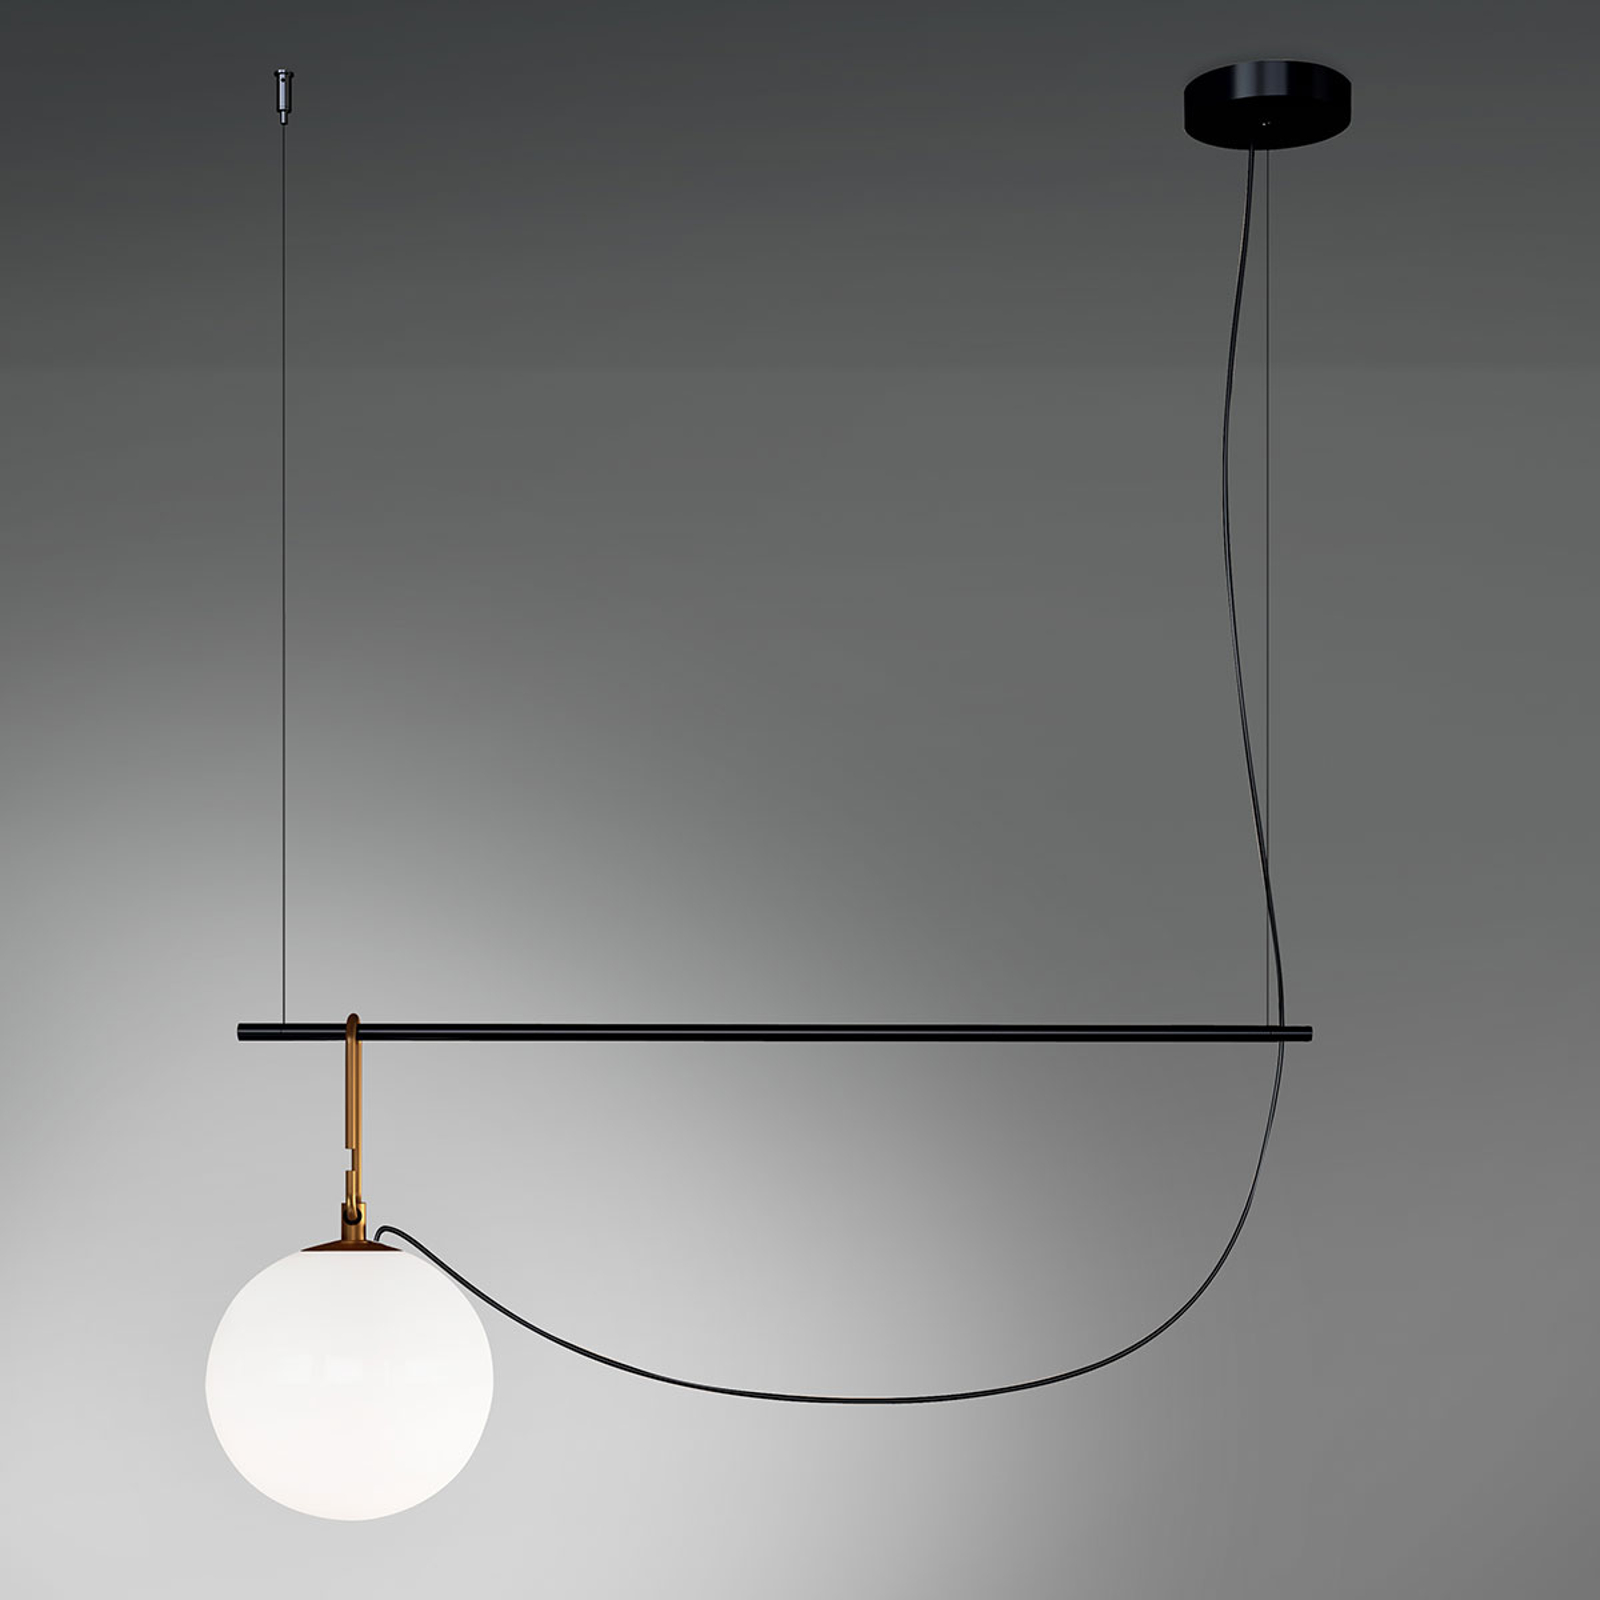 Artemide nh S2 22 hanglamp 90,5 cm bol Ø 22cm